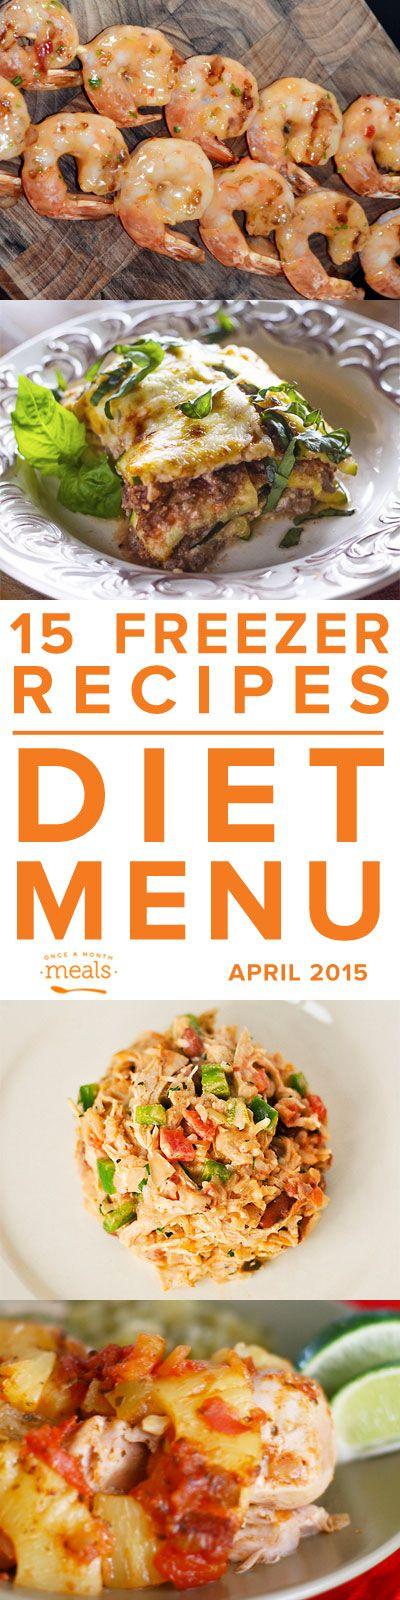 Diet April Freezer Menu 2015 – Trim Healthy Mama Compliant | Once A Month Meals | OAMC | Freezer Cooking | Freezer Meals  | Custom Menus | Menu Planning